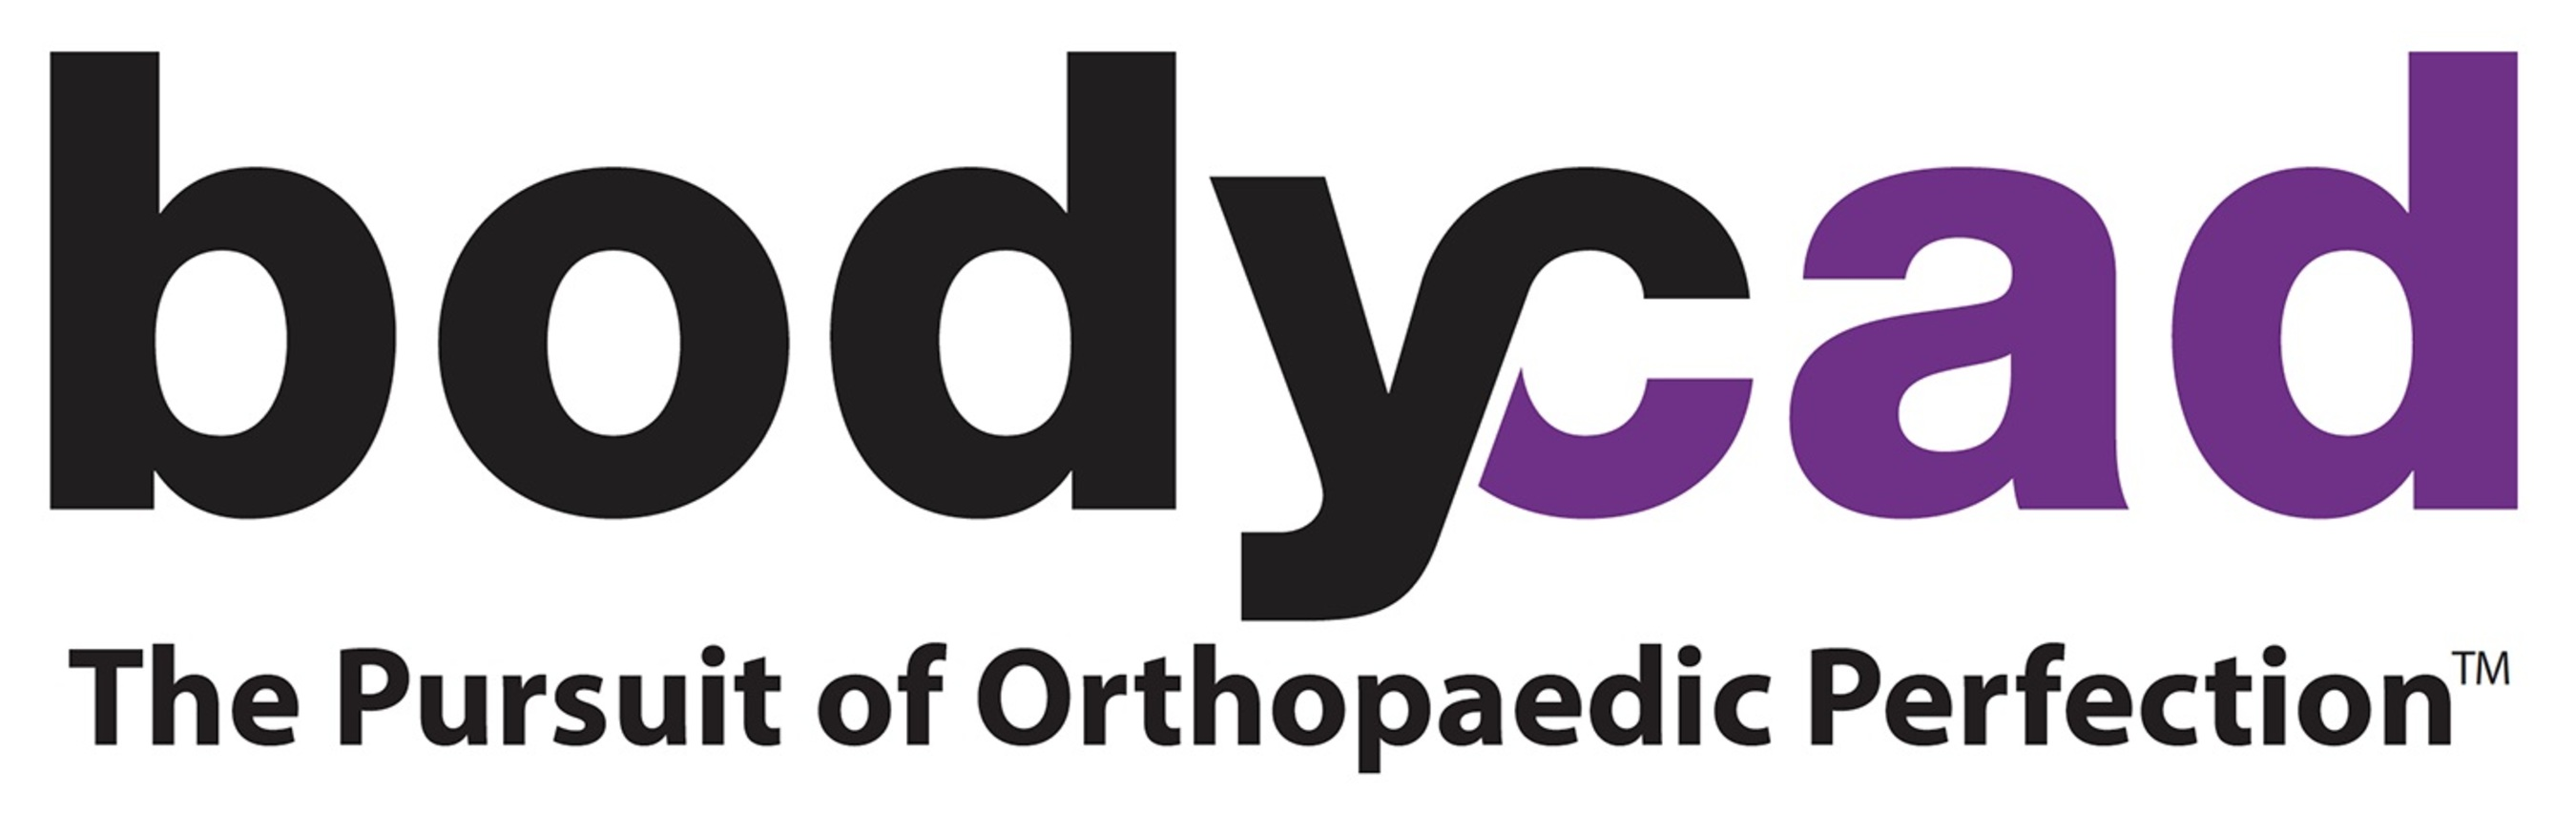 bodycad logo